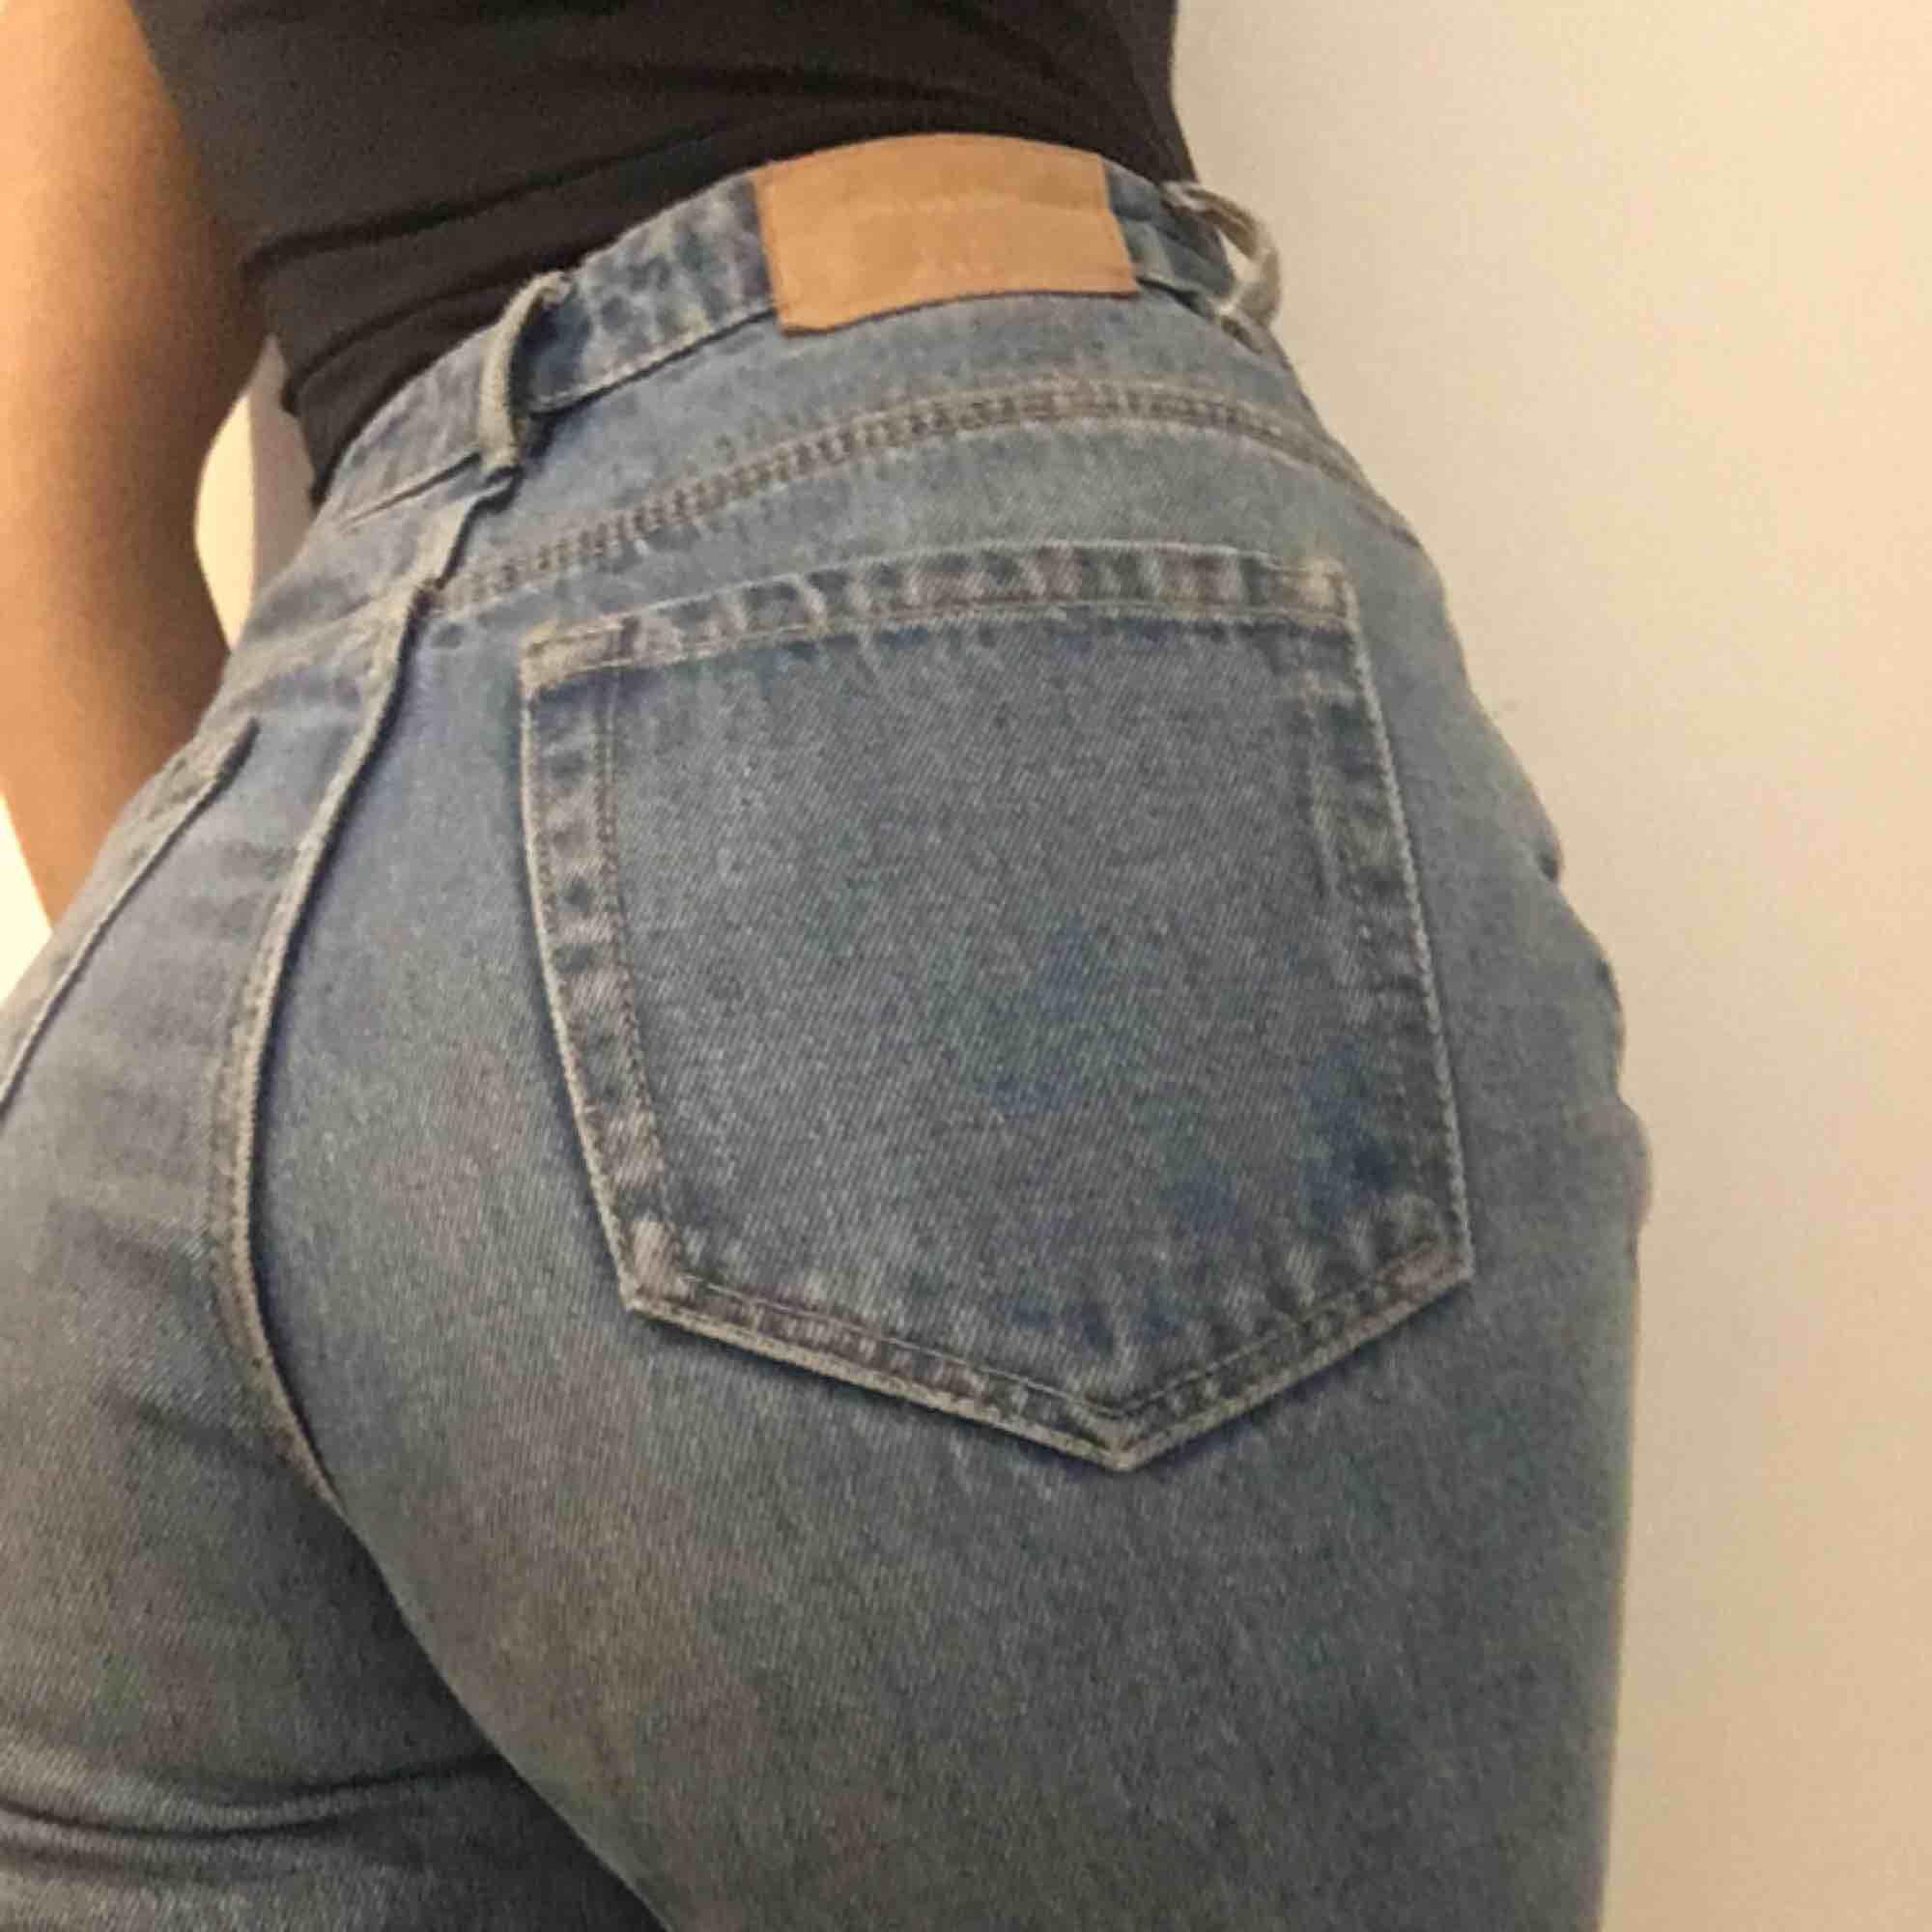 Monki-jeans, 150 kronor. Väldigt sköna 💖💖💖. Jeans & Byxor.